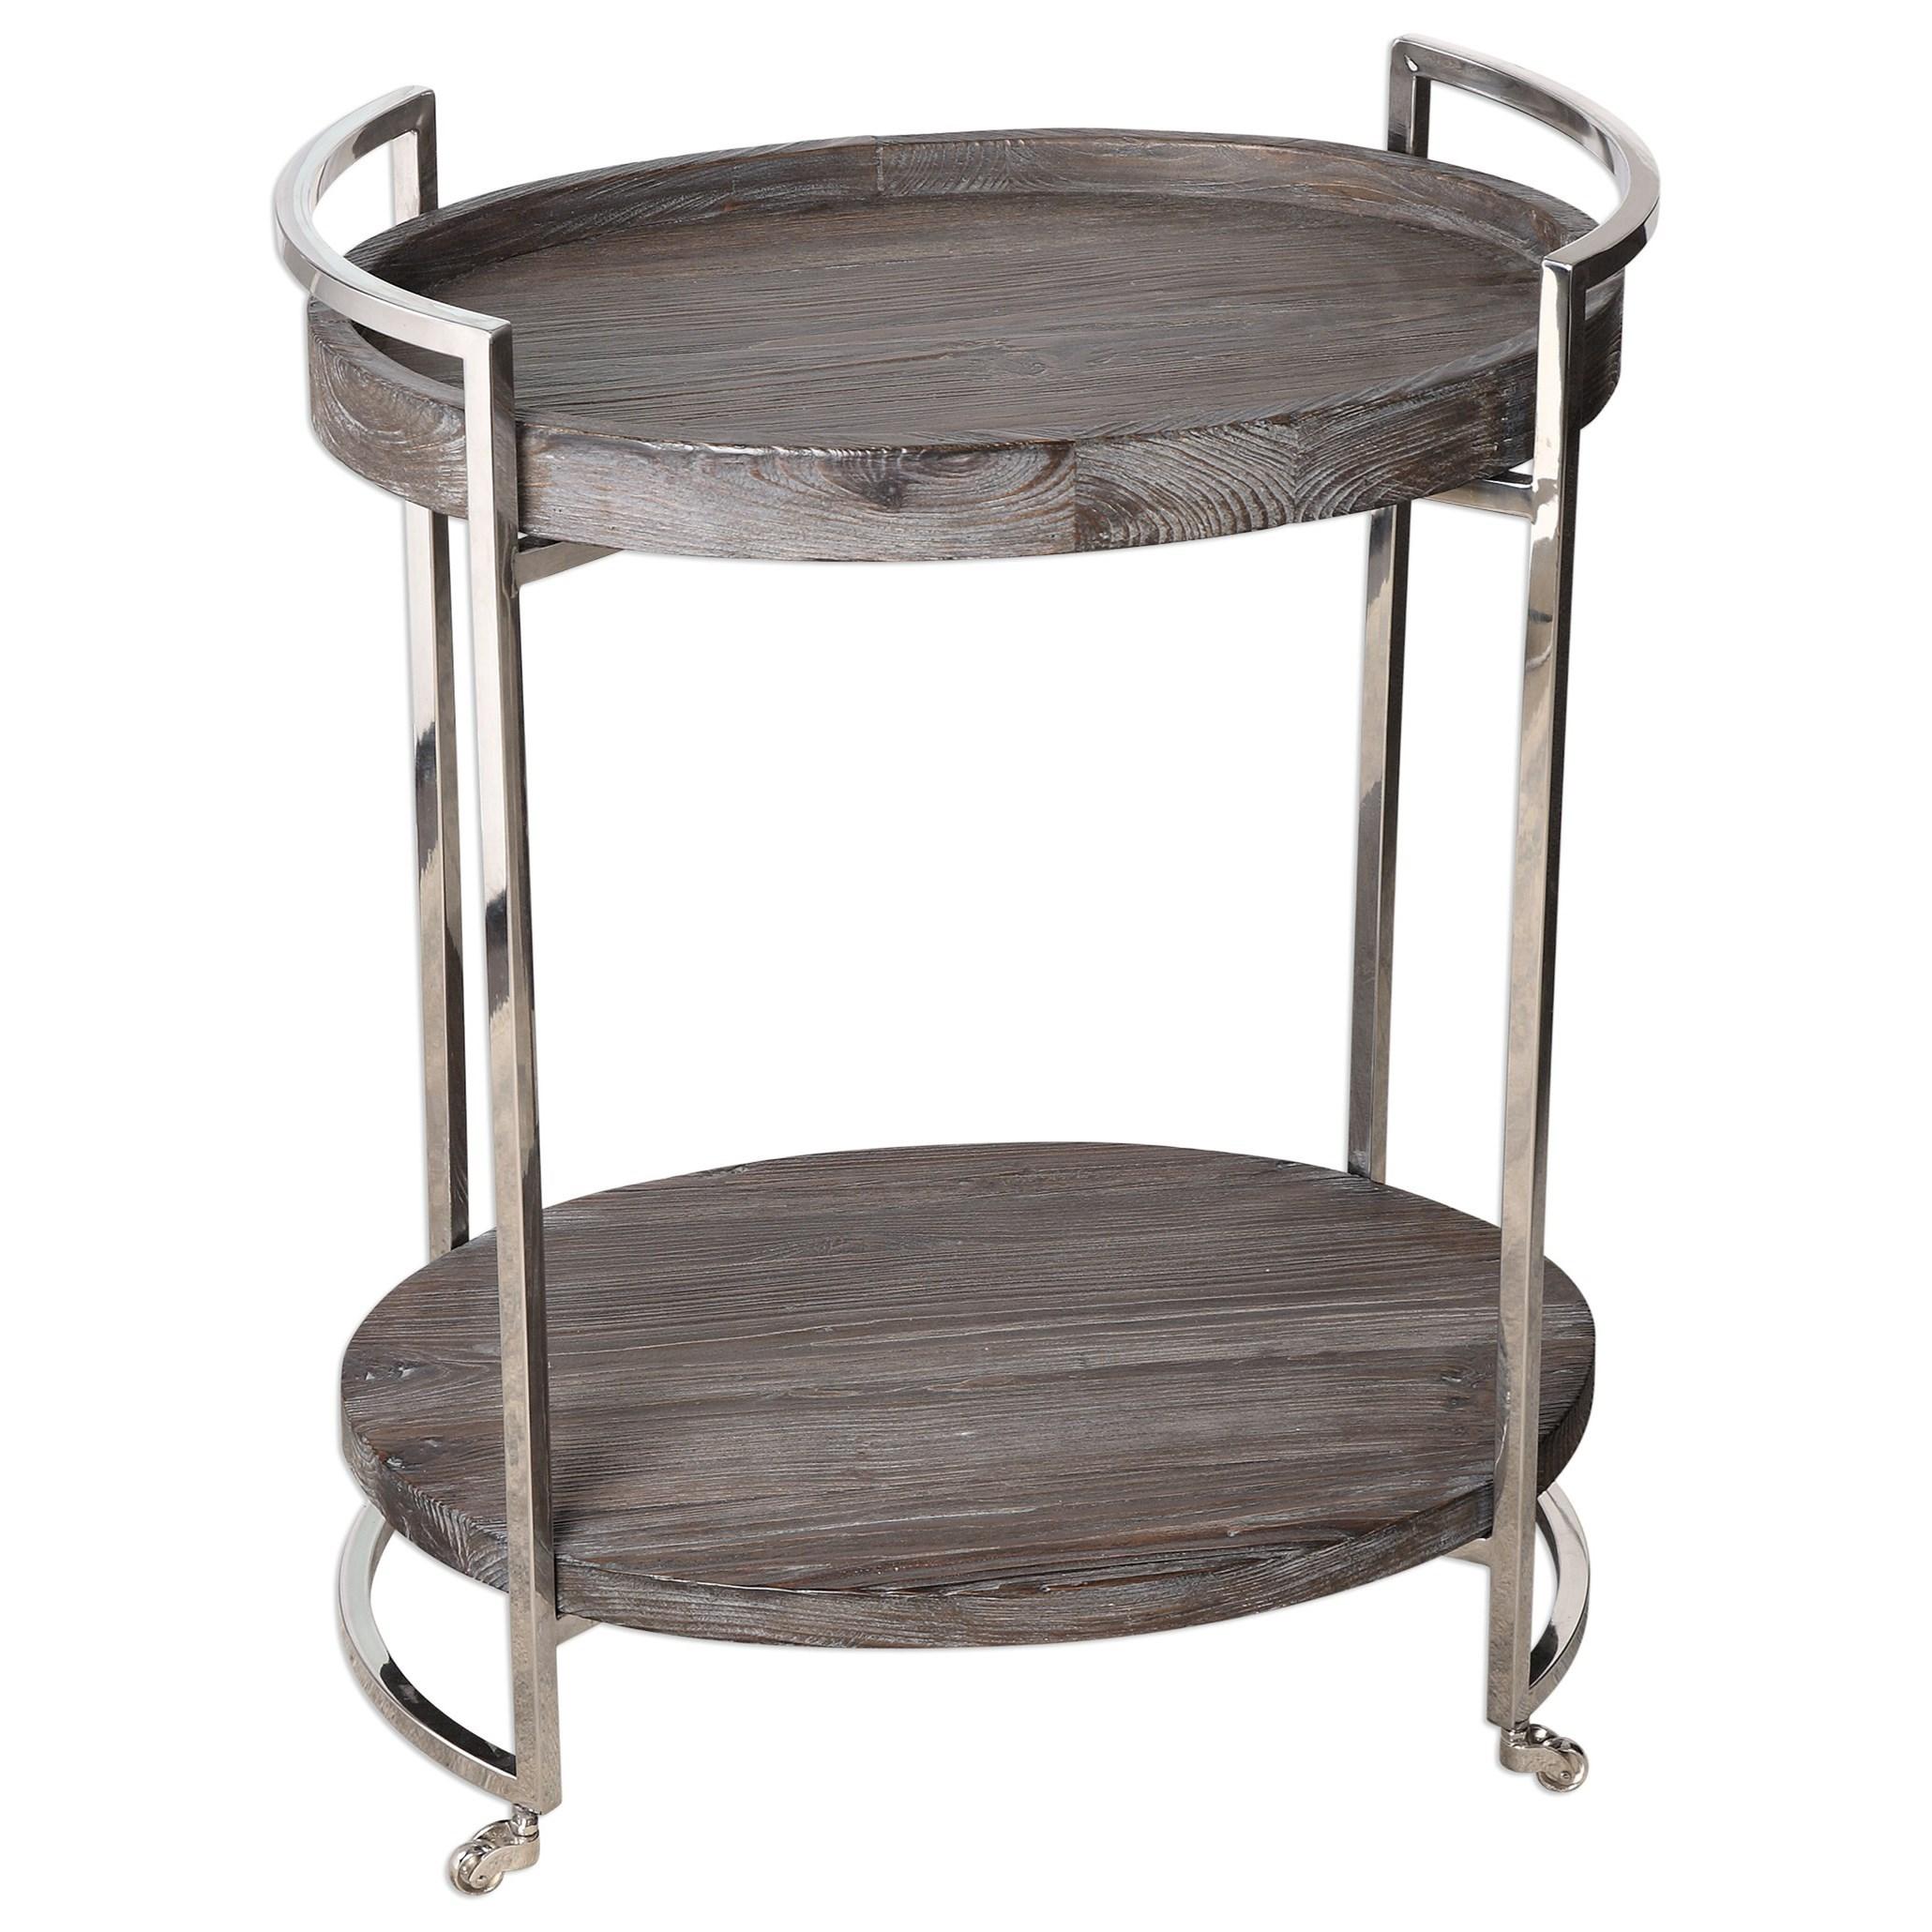 Uttermost Accent Furniture  Colin Wooden Serving Cart - Item Number: 24683